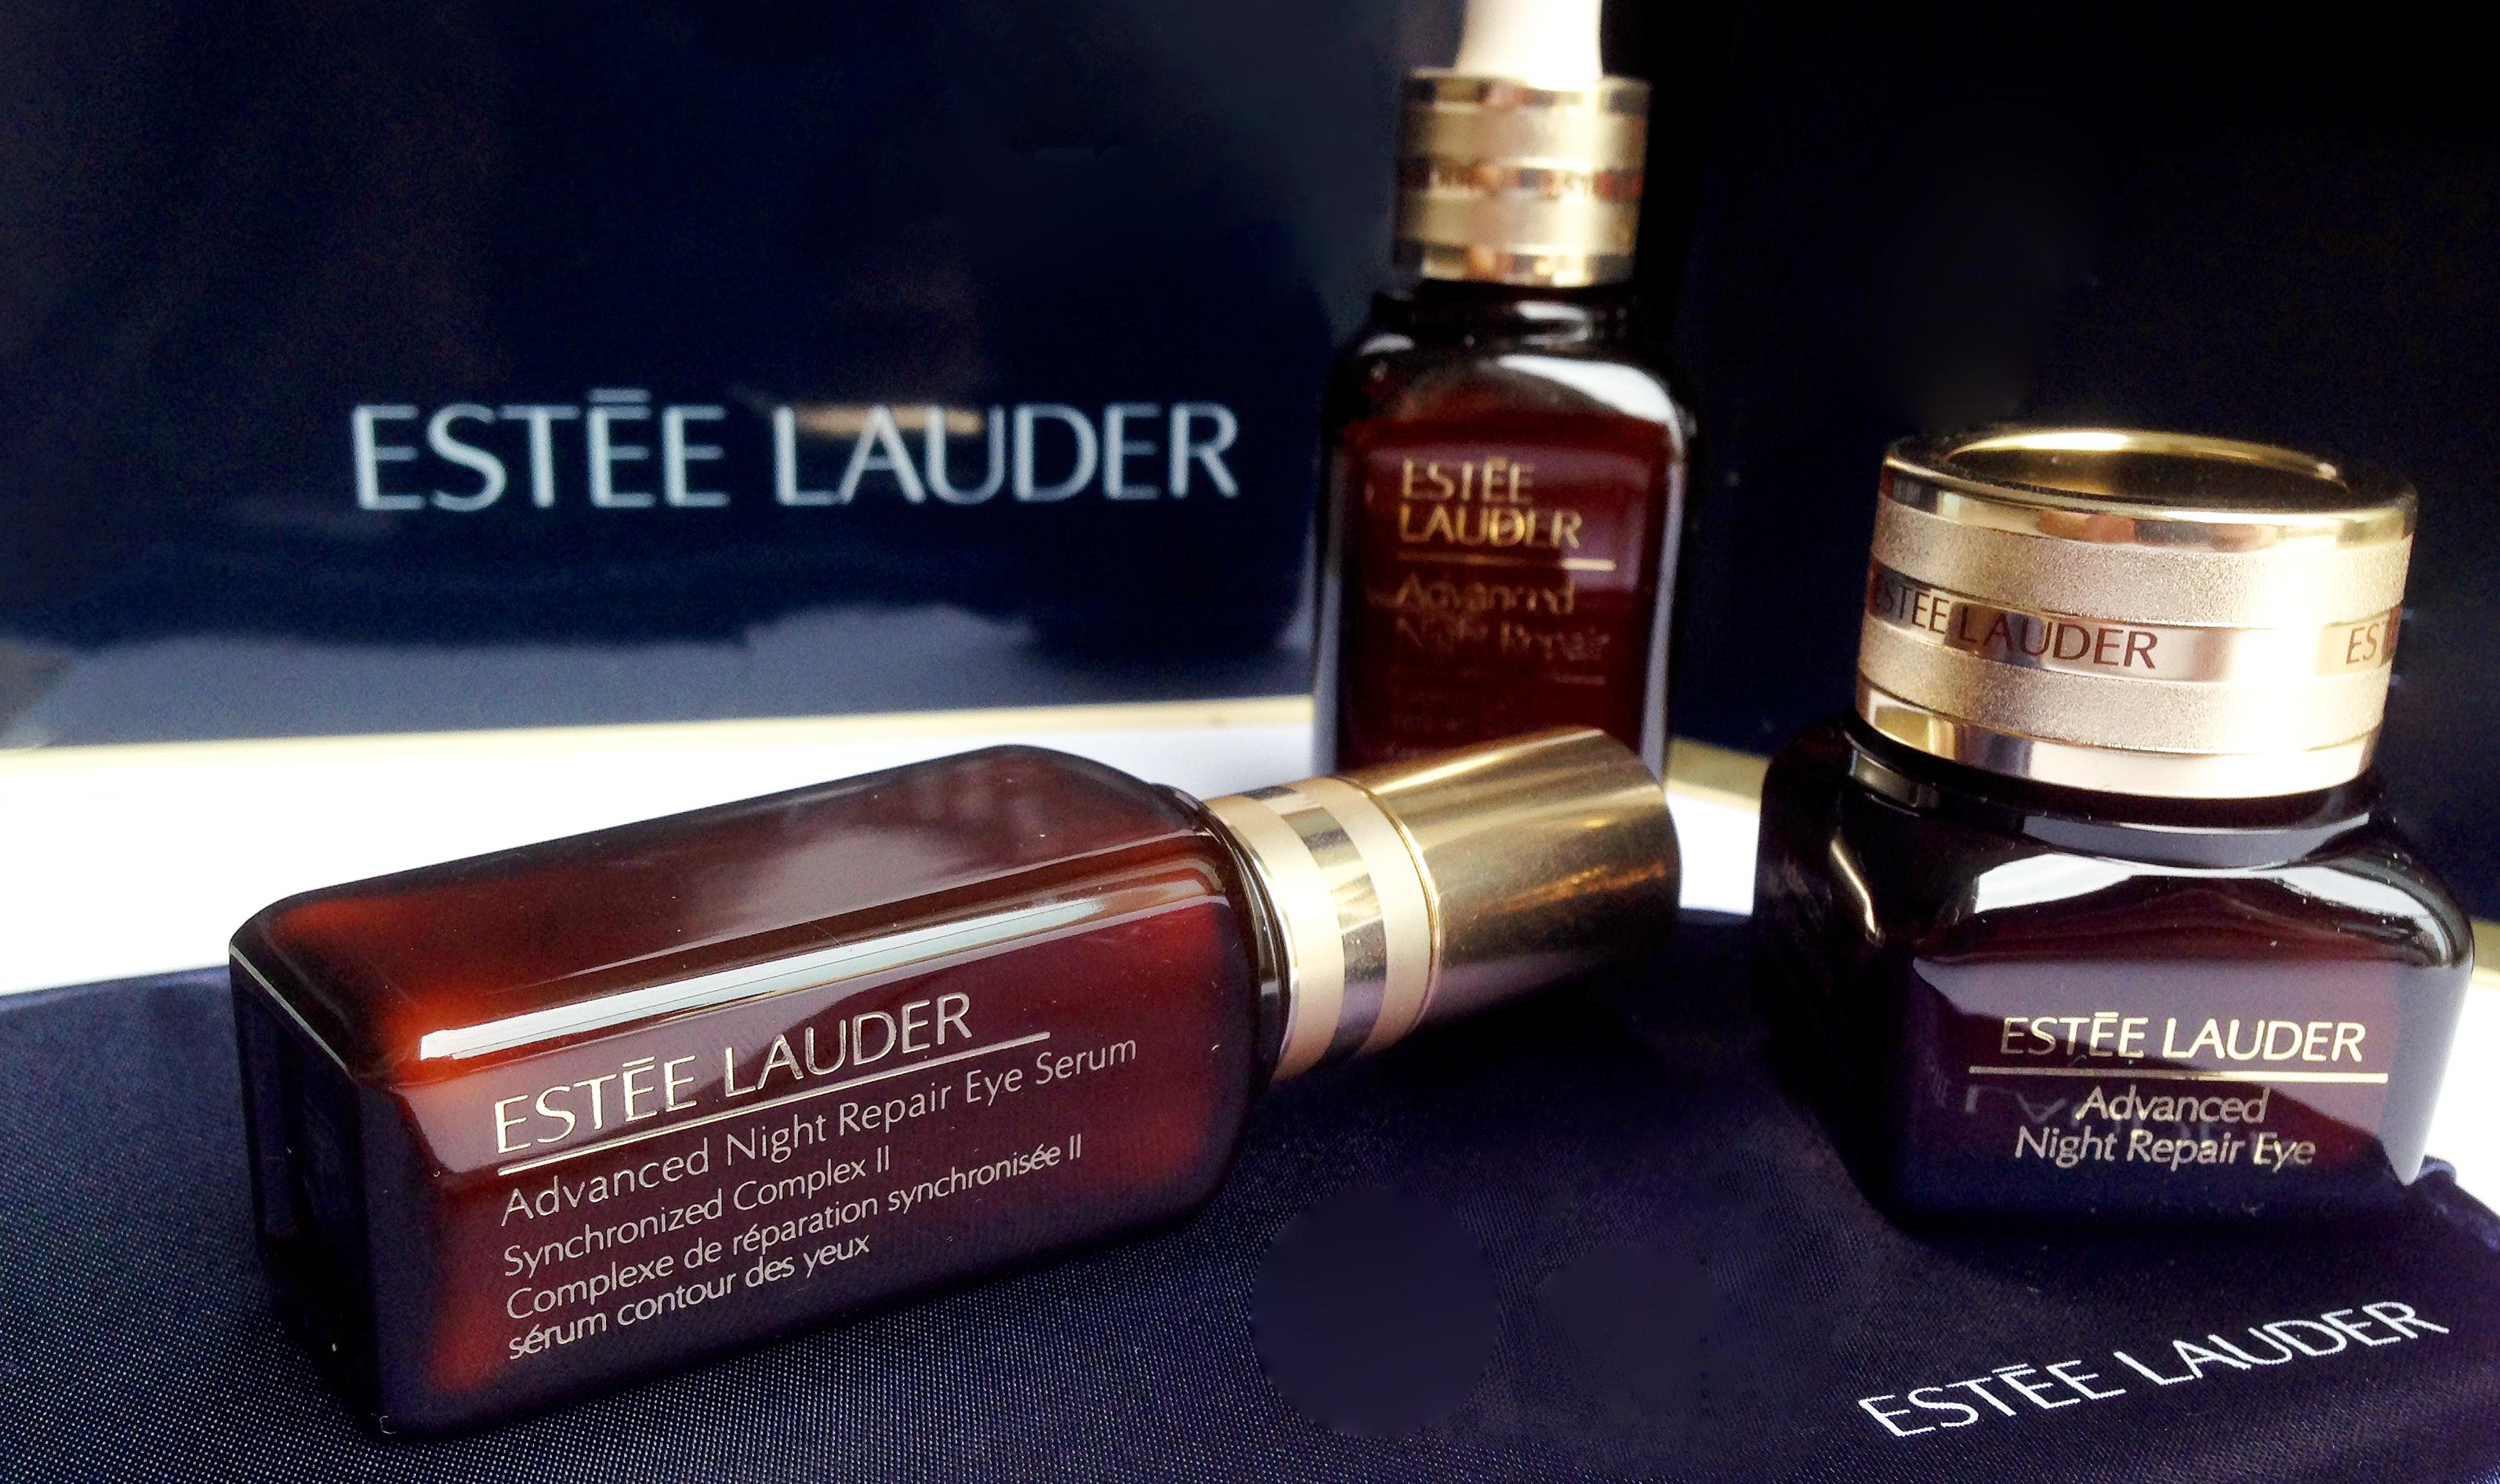 Estee Lauder New Advanced Night Repair Eye & GIVEAWAY!! - Silverkis' World